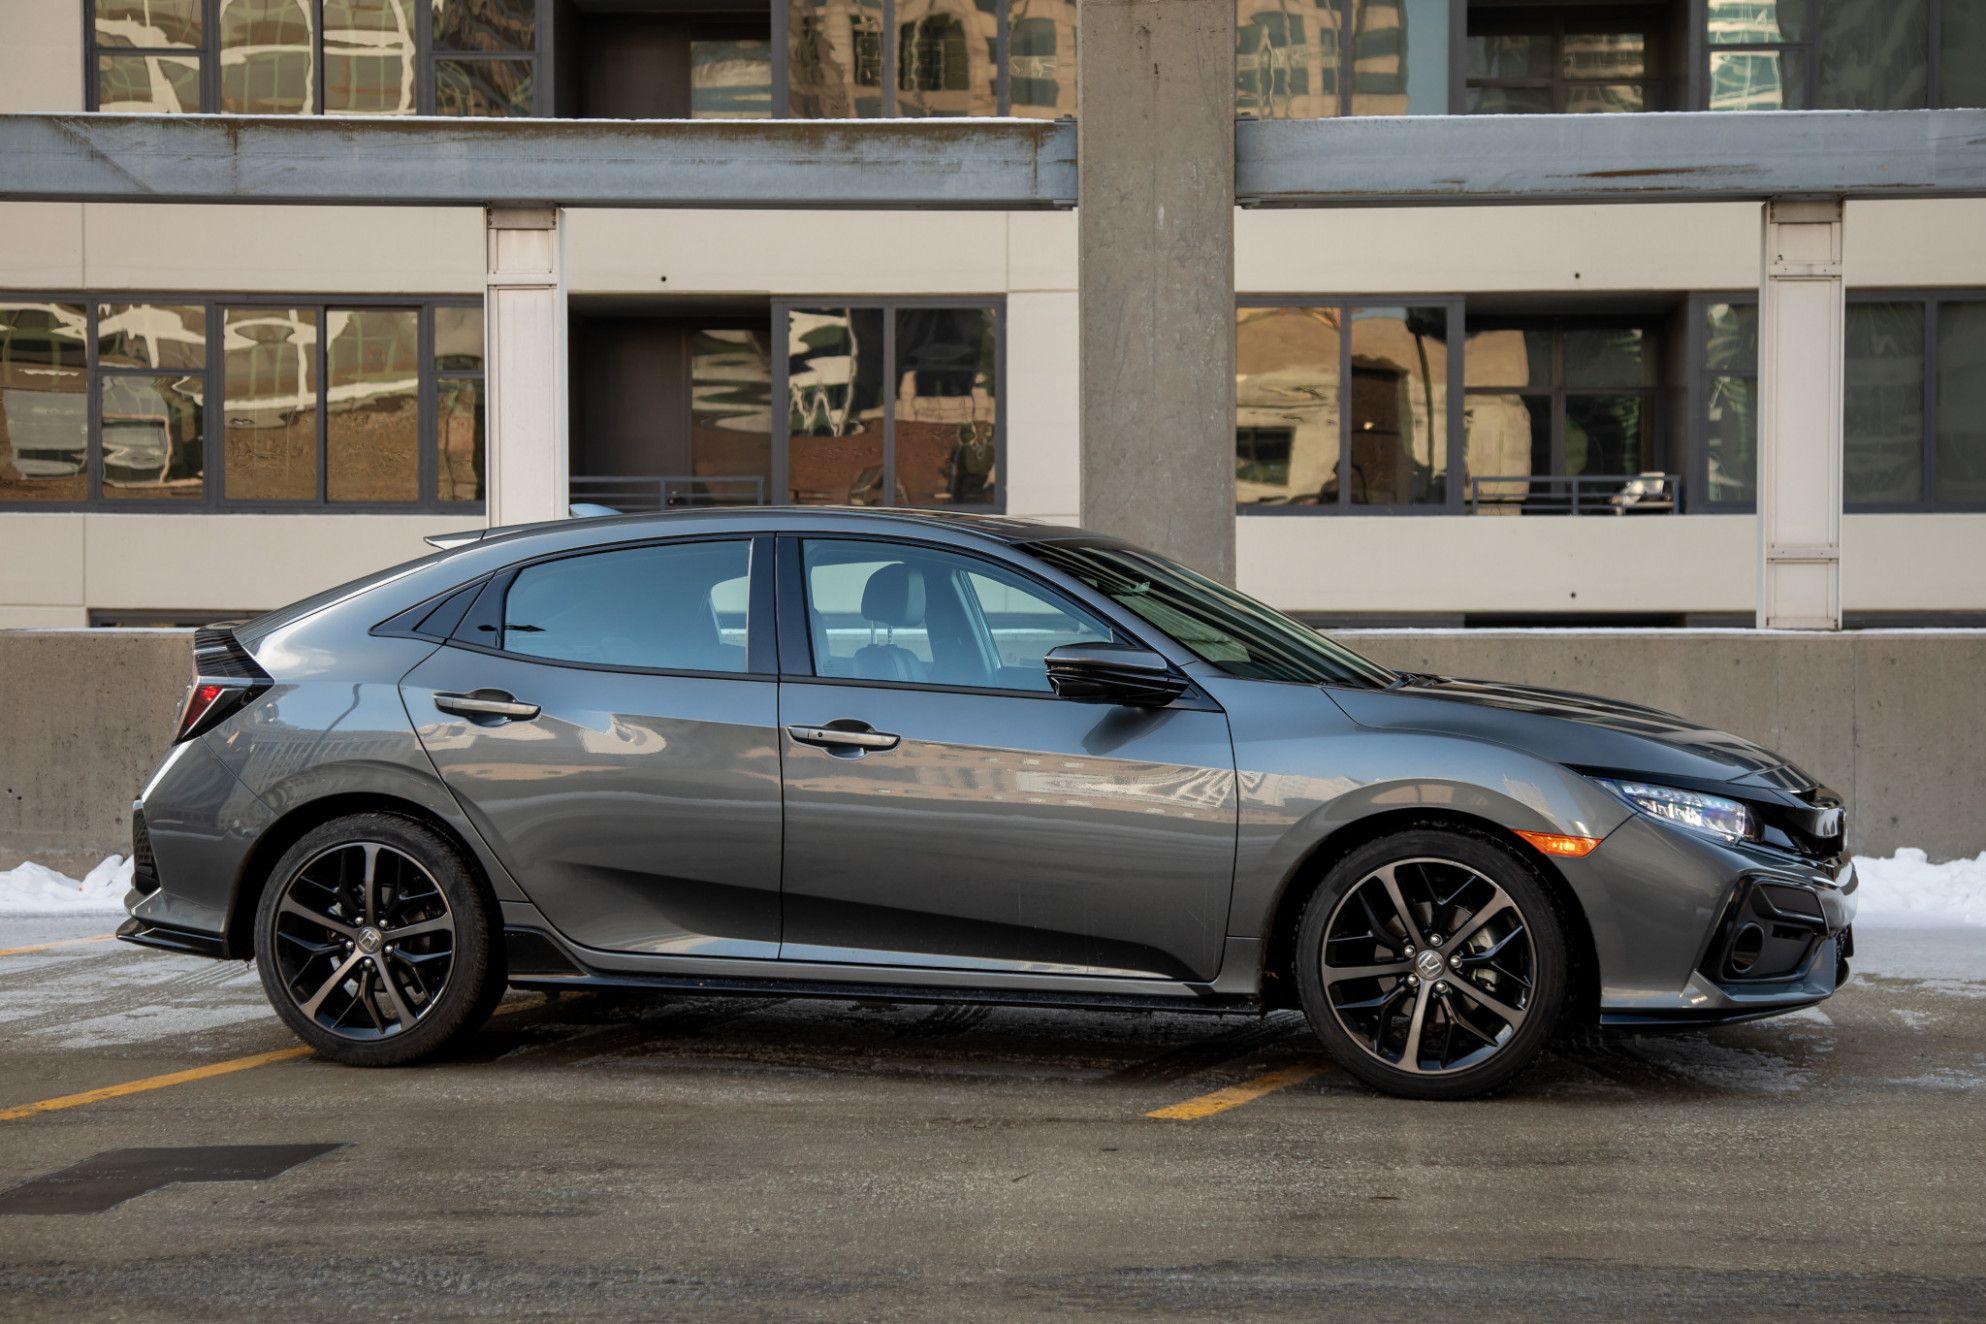 7 Picture 2020 Honda Civic Hatchback in 2020 Honda civic